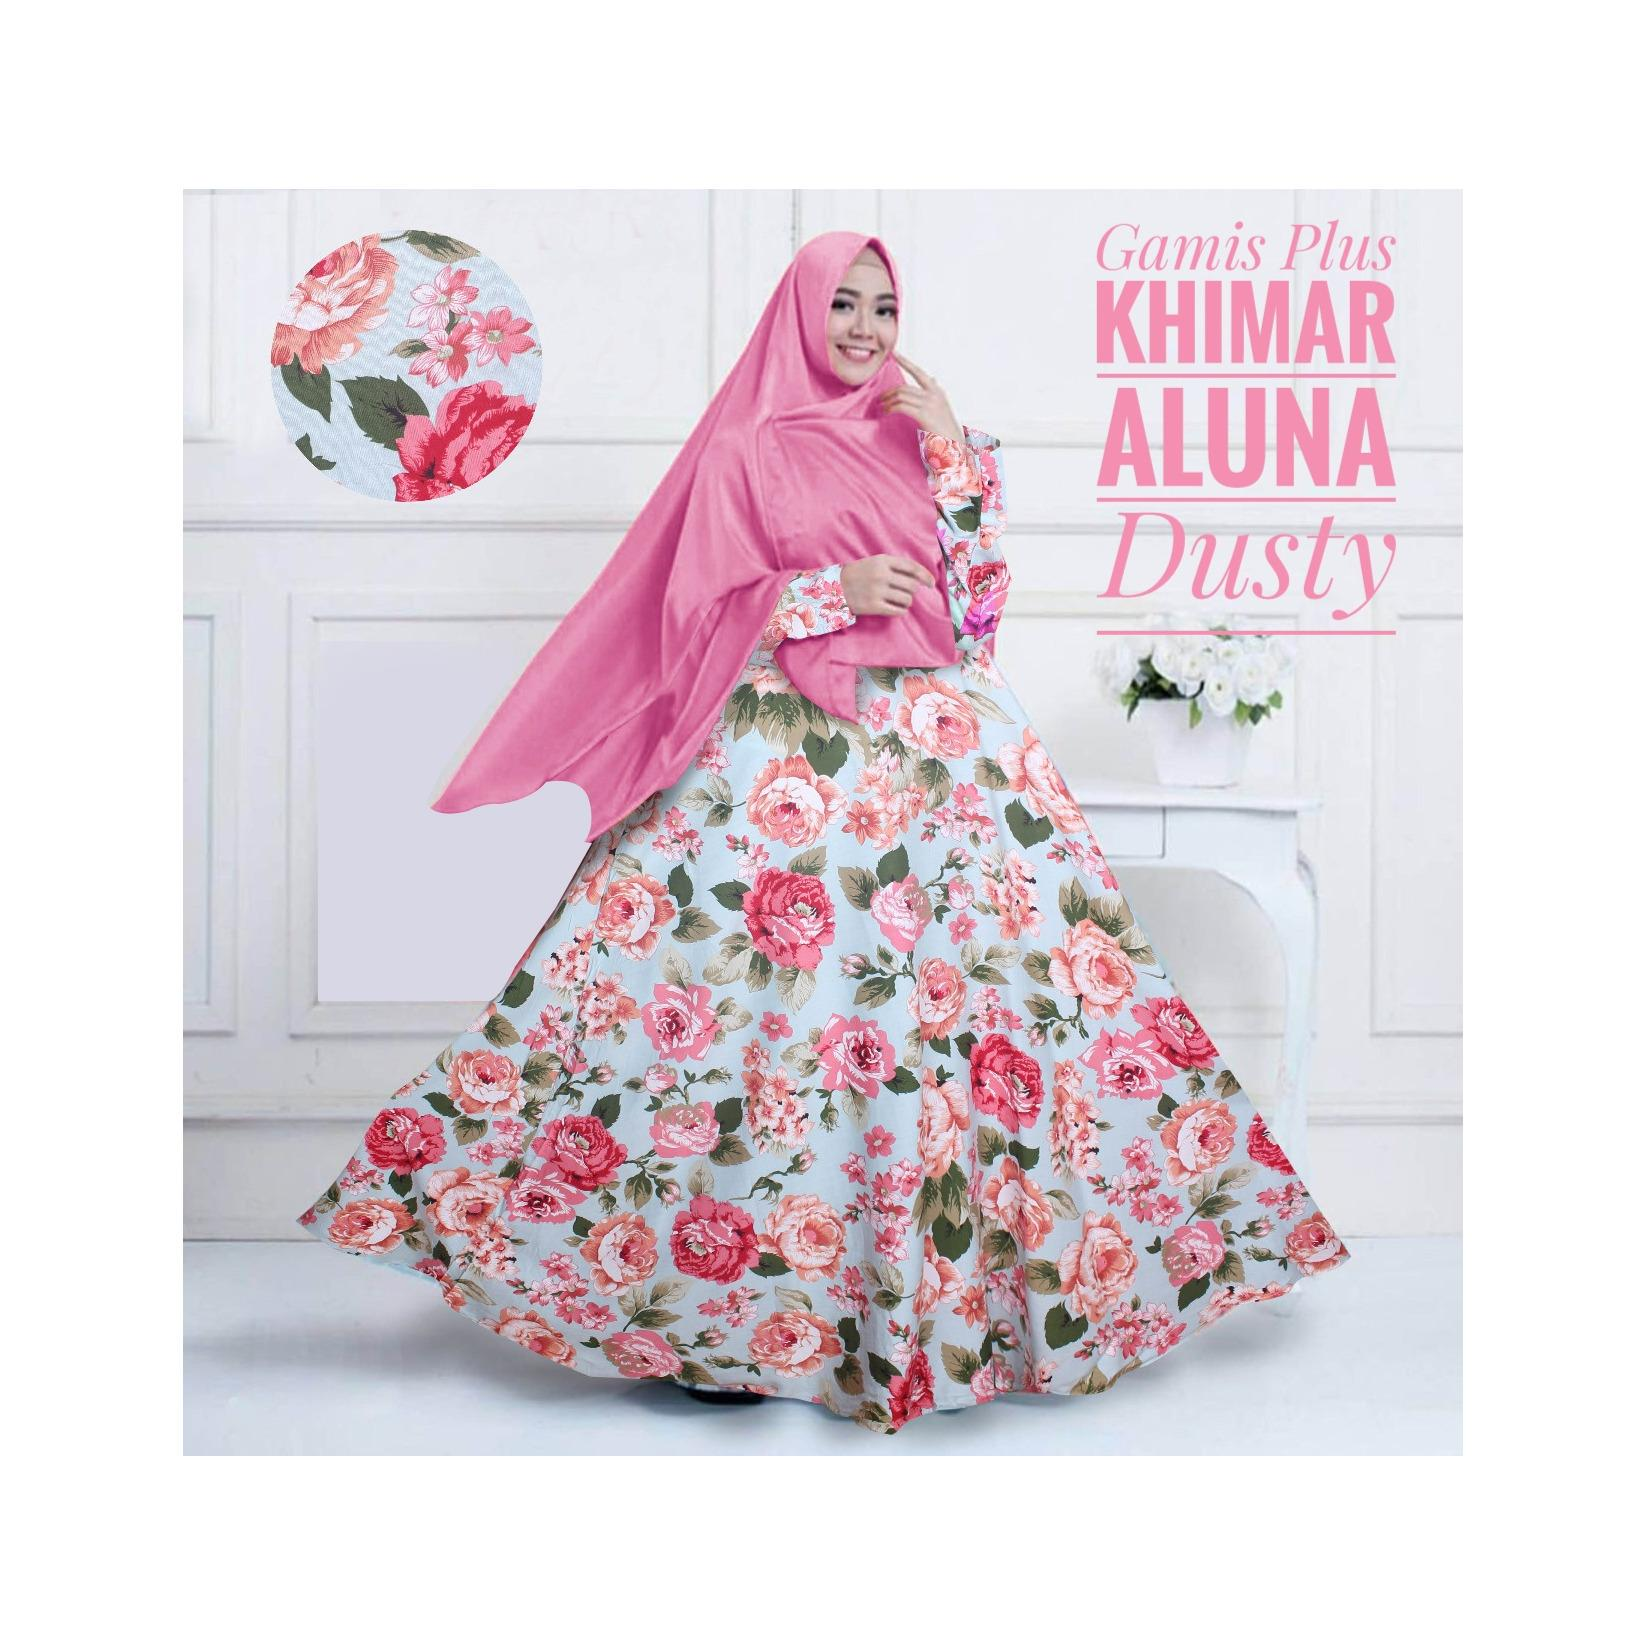 Gamis Katun Syari Murah / Gamis Maxi Dress Katun Aluna Plus Khimar Dusty Pink / Gamis Katun Busui